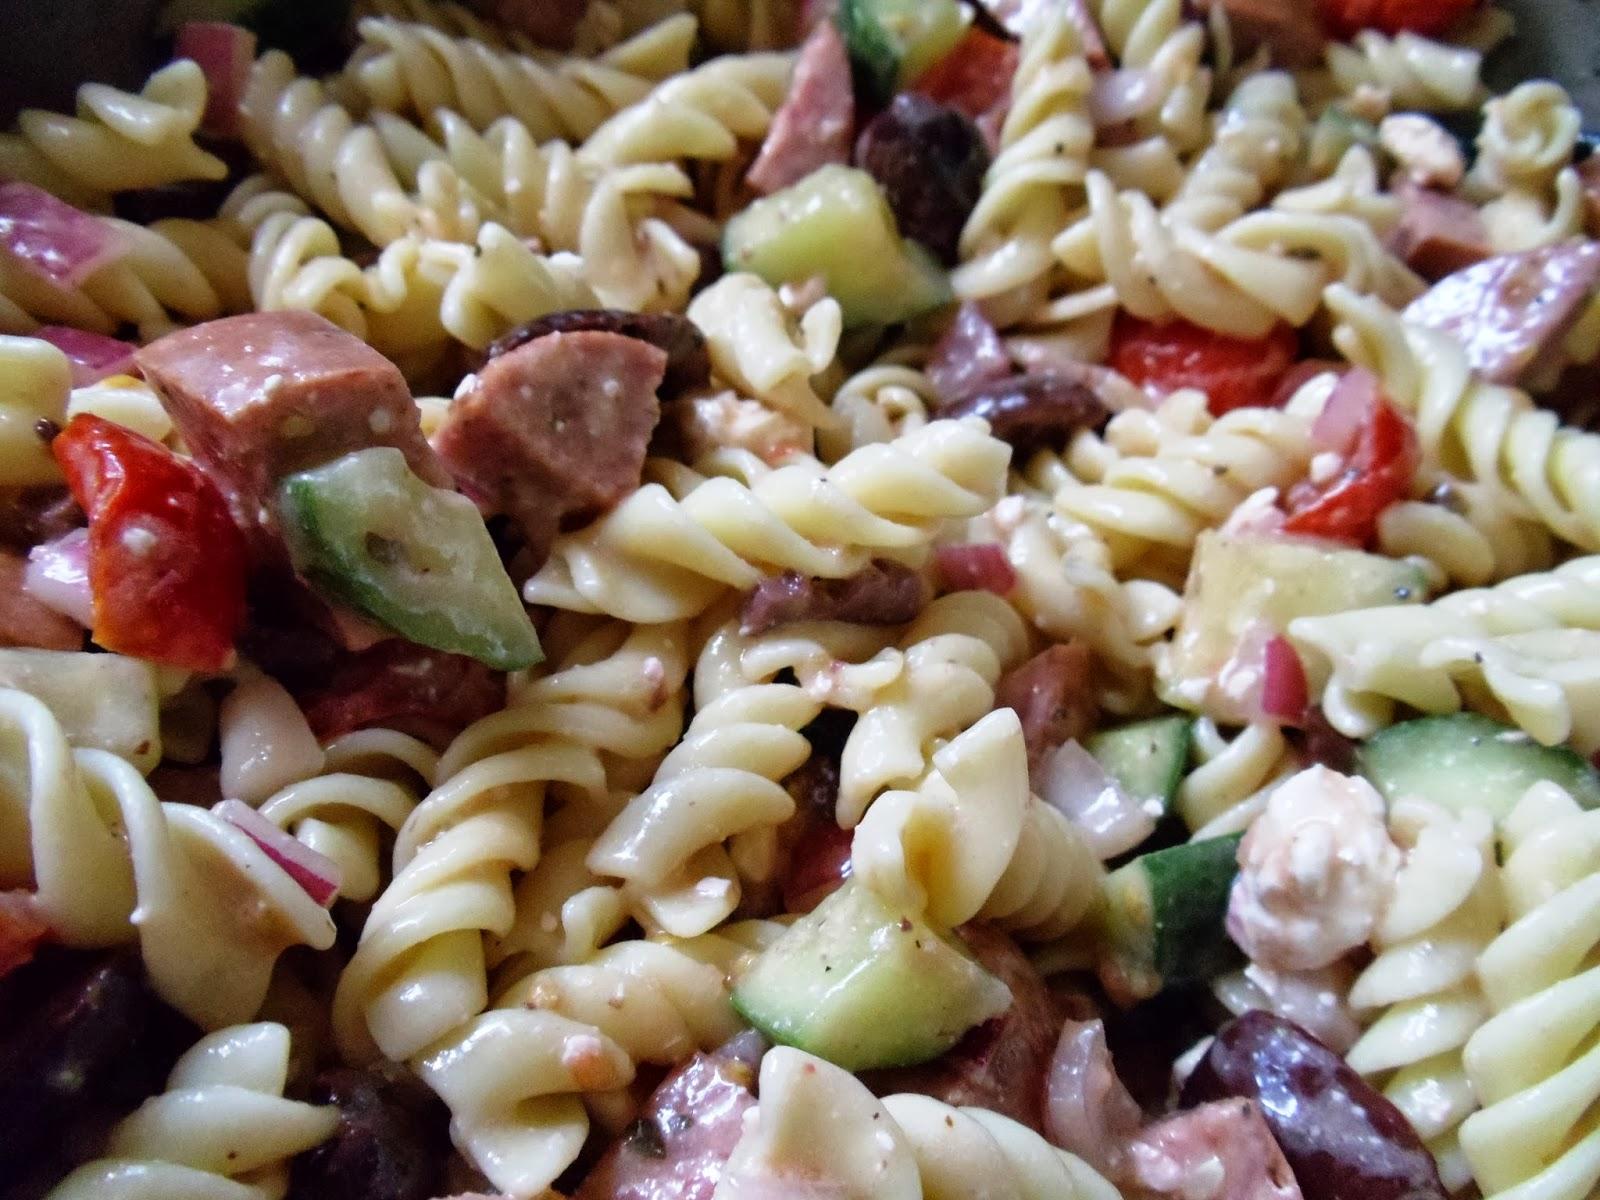 Omnivorous Indulgence: Greek Style Summer Sausage Pasta Salad